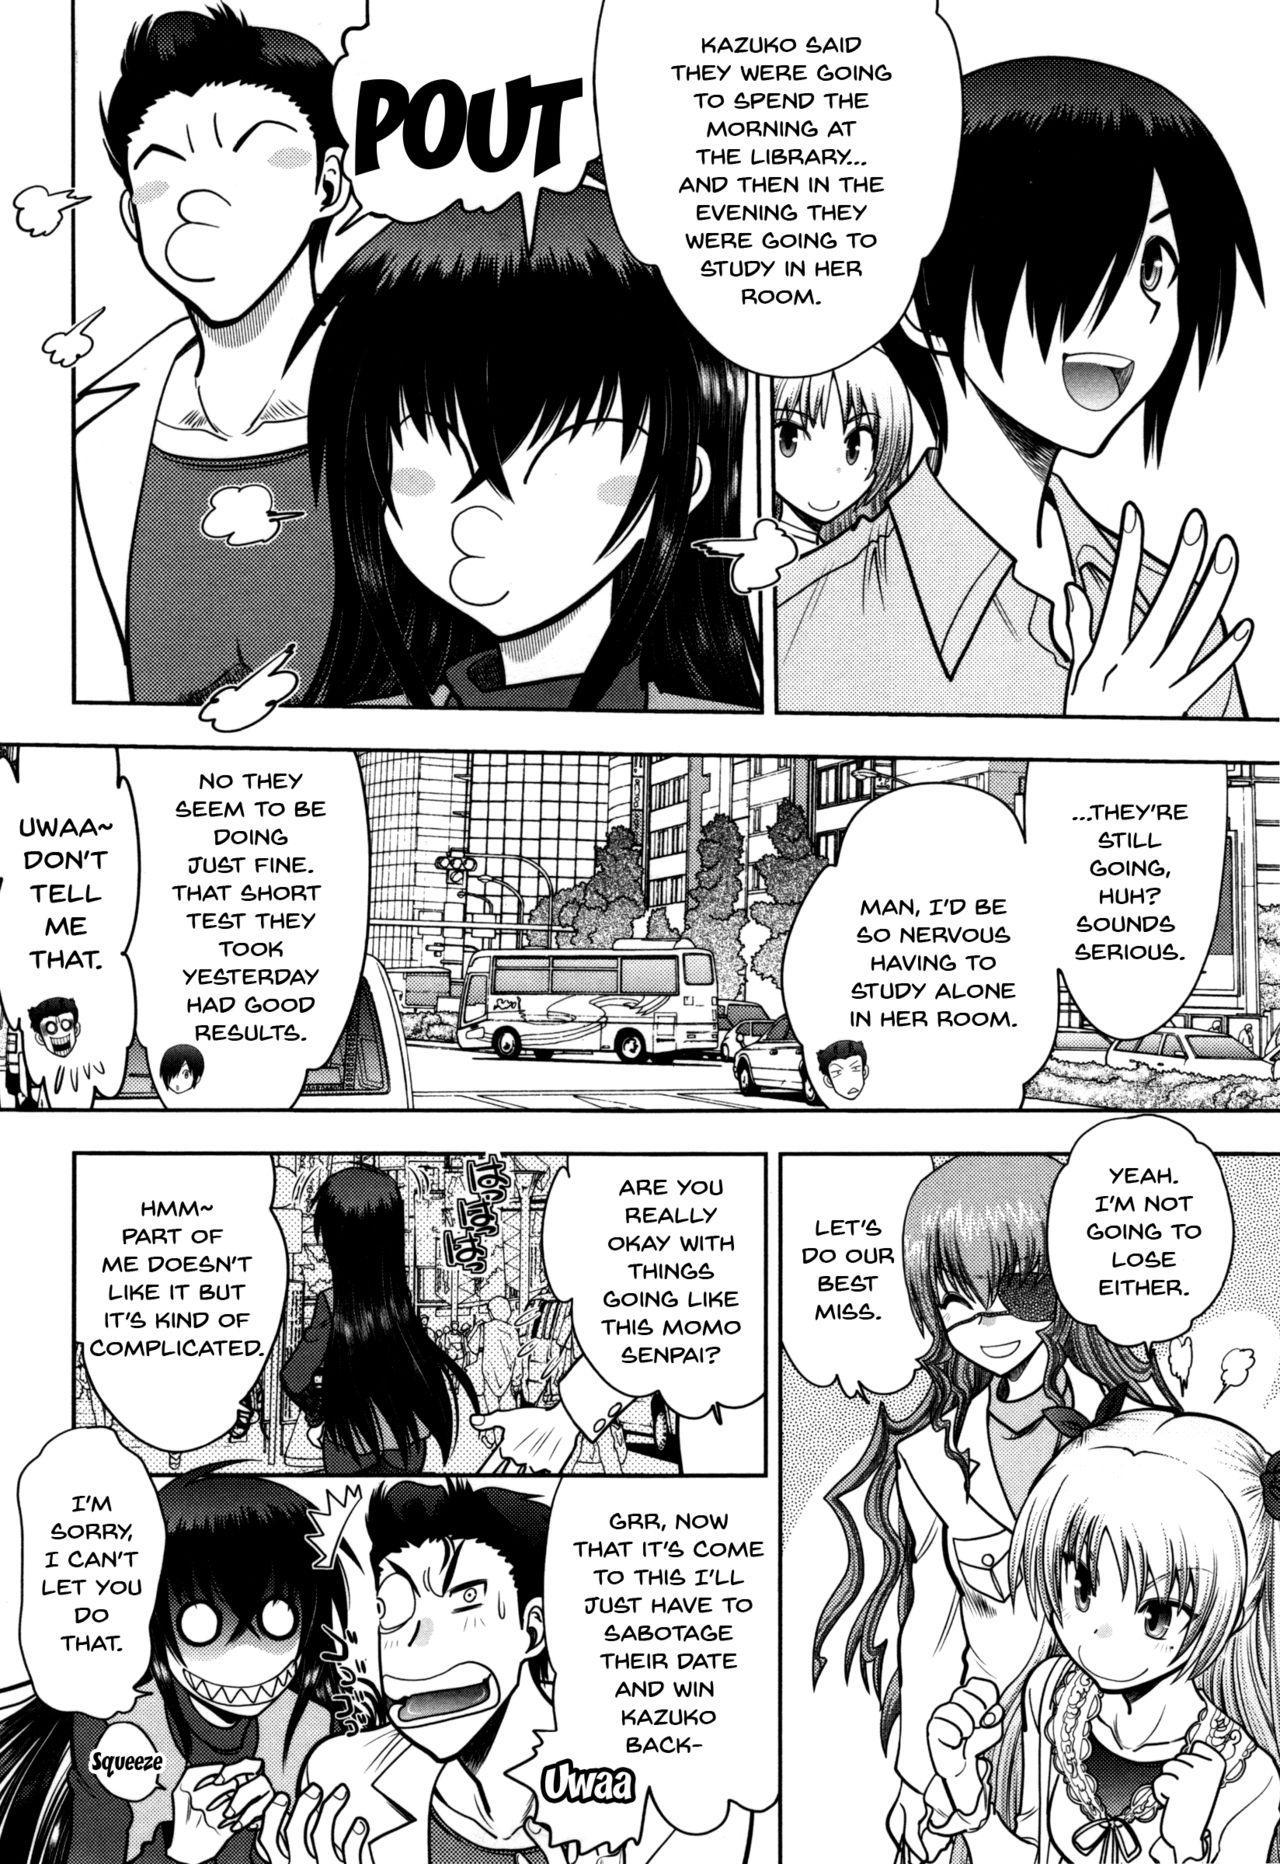 [Yagami Dai] Maji de Watashi ni Koi Shinasai! S Adult Edition ~Shodai Heroine Hen~ | Fall in Love With Me For Real! Ch.1-8 [English] {Doujins.com} 66